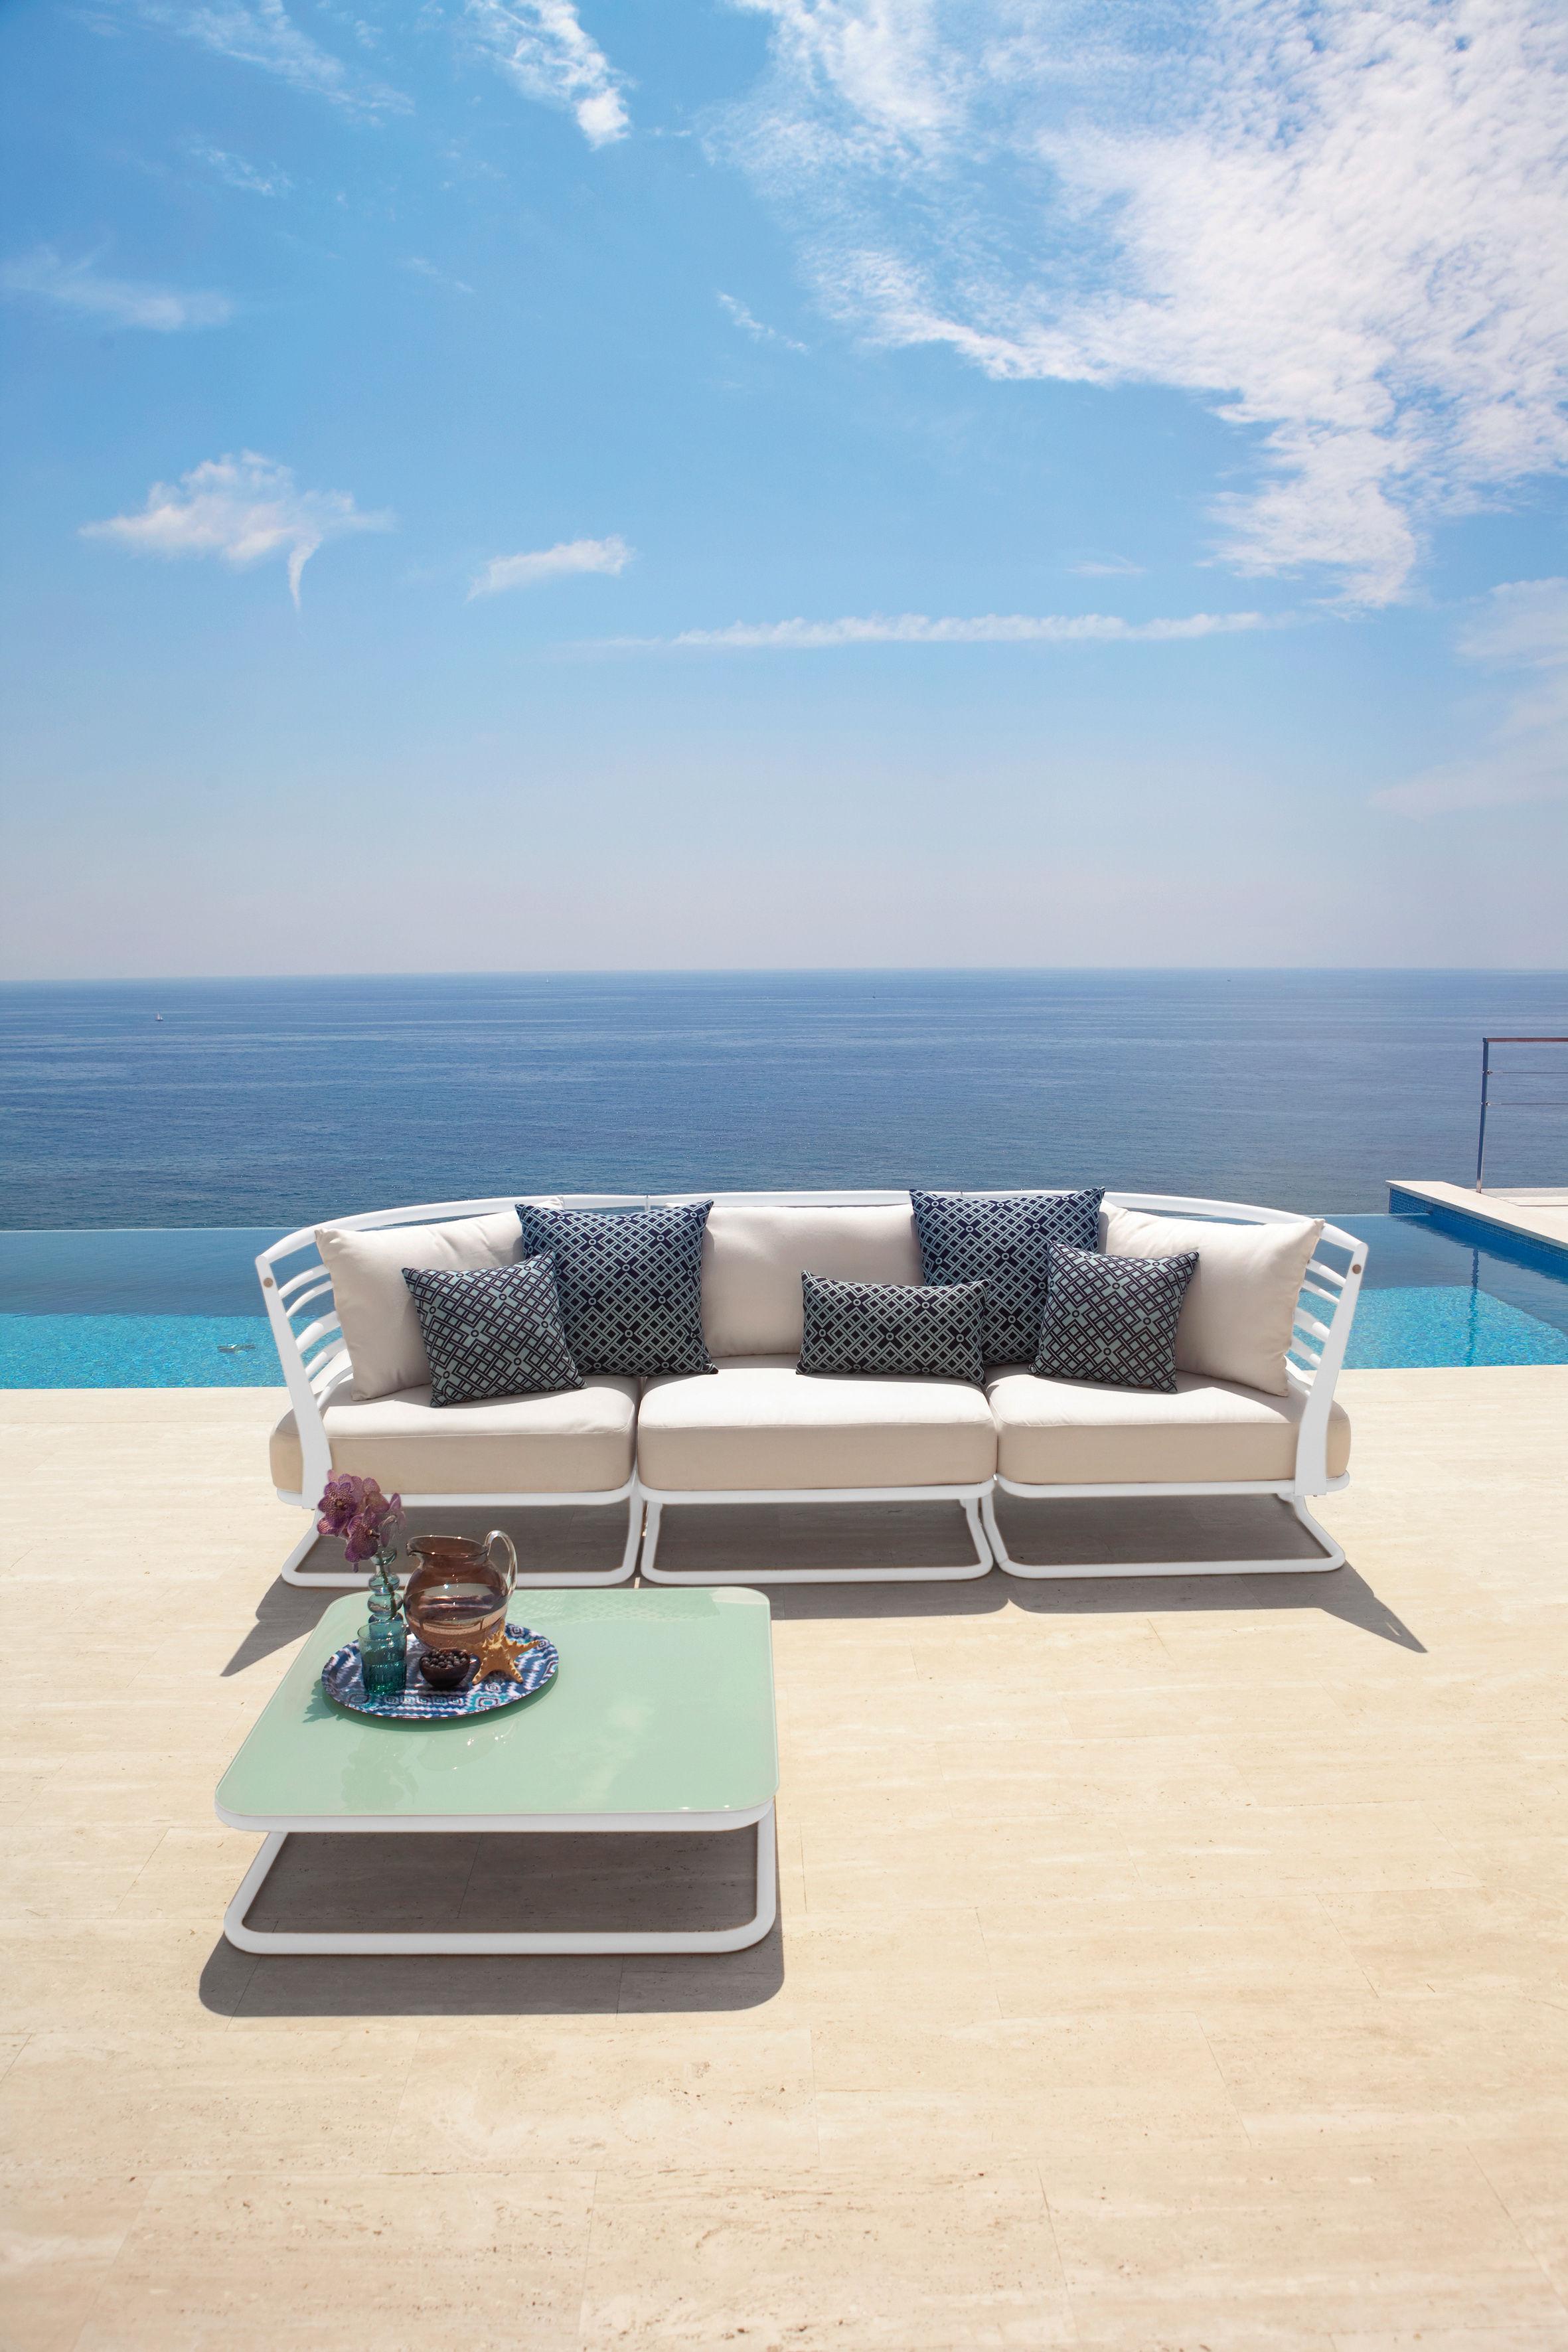 Soft ware labyrinthe outdoor kissen f r den au eneinsatz 55 x 55 cm 55 x 55 cm blau - Outdoor kissen fur loungemobel ...